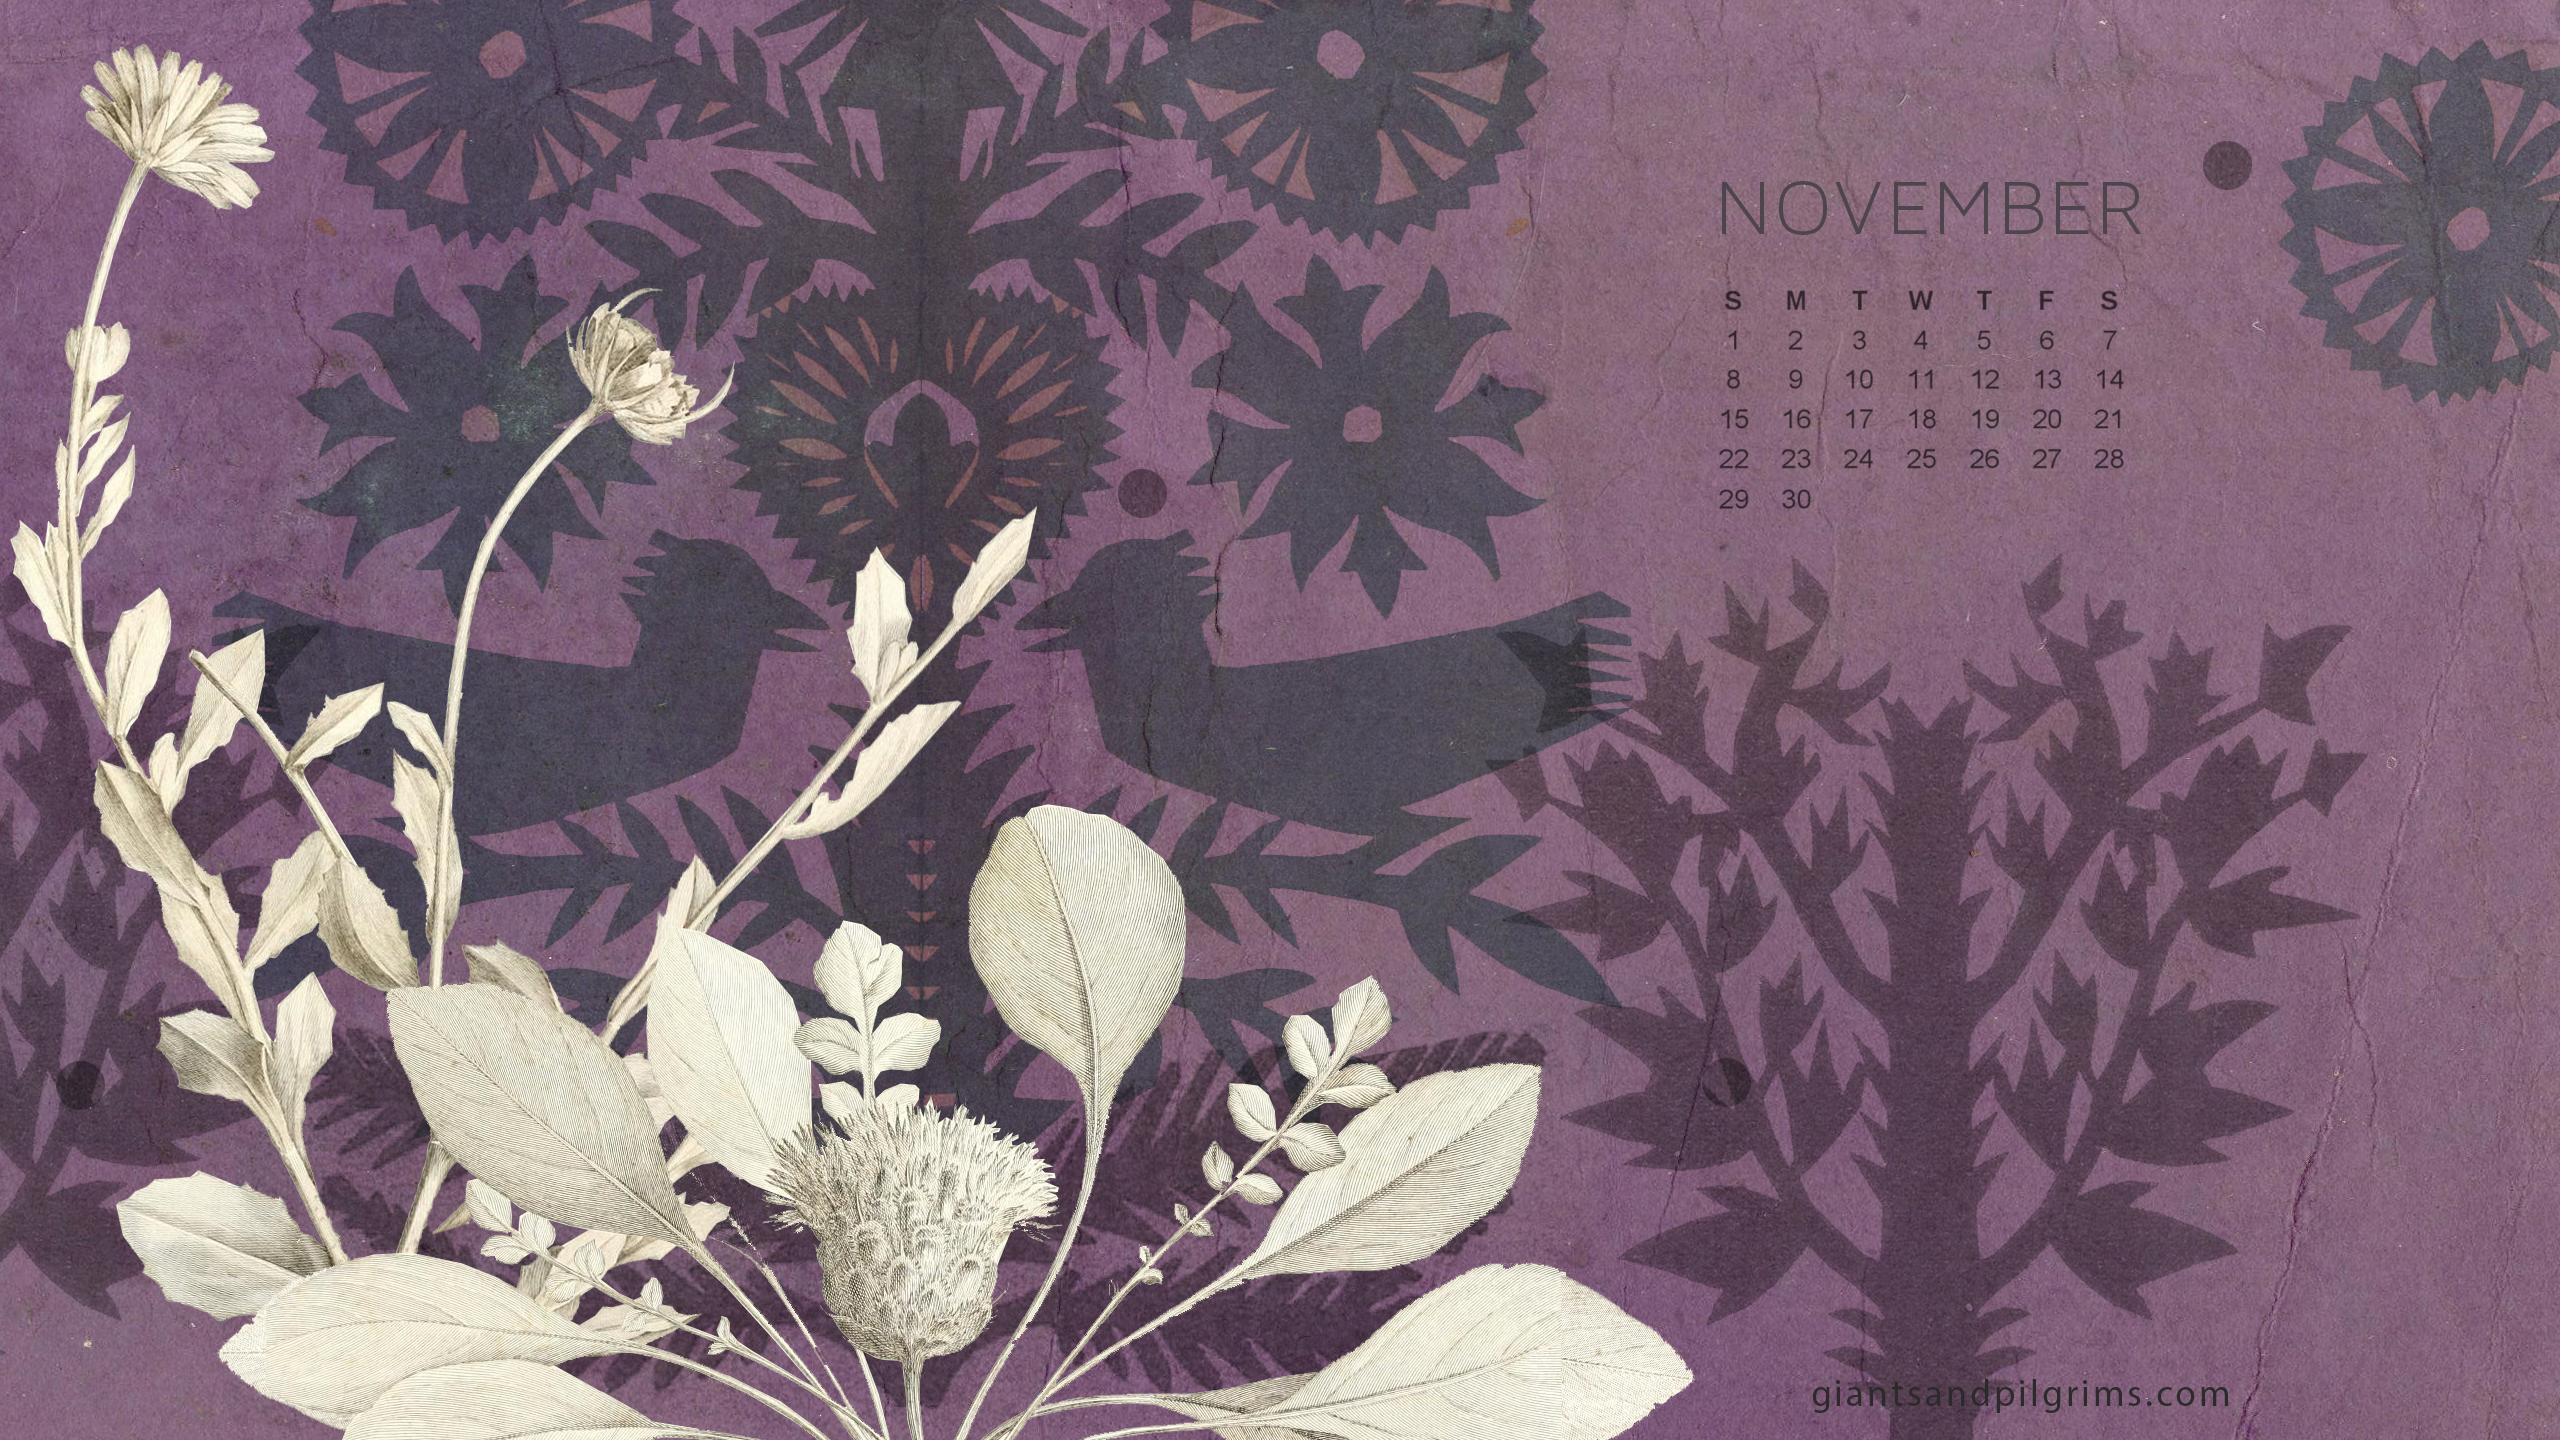 November Calendar Desktop and iPhone Wallpaper Giants 2560x1440